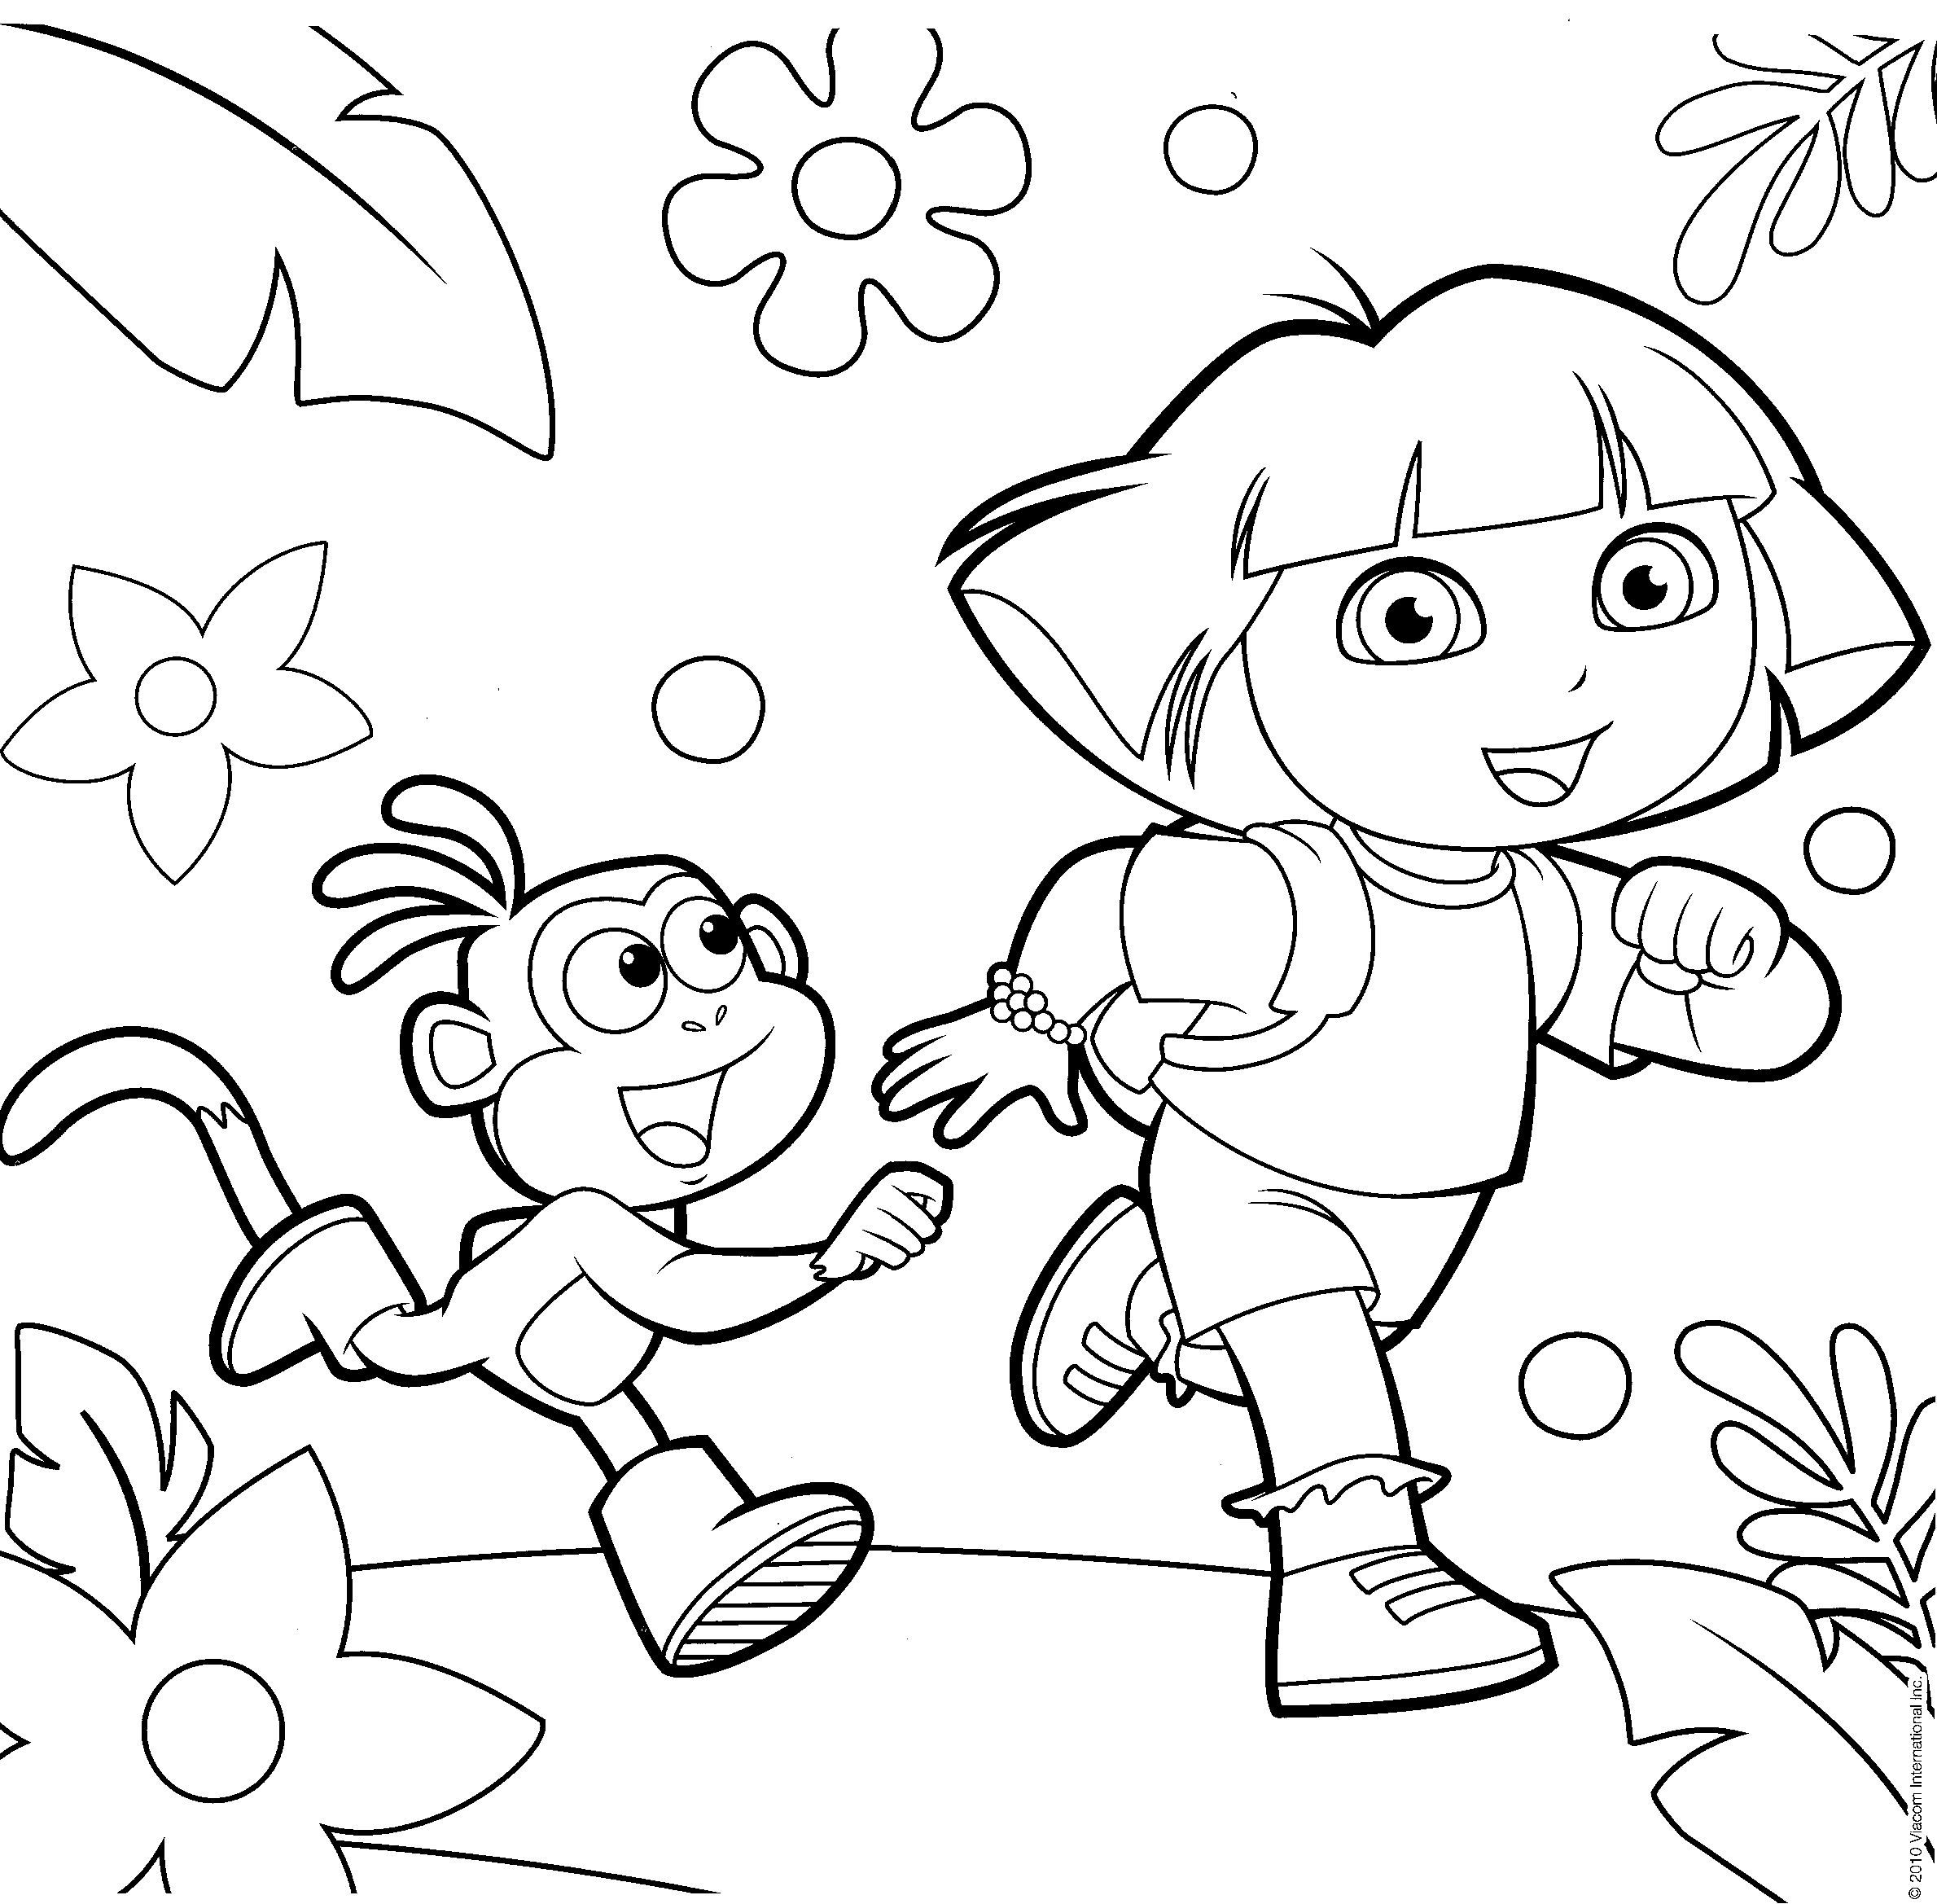 69a58fdffa3708cb5c5d28401c7ea728 » Dora Picture For Kids To Color